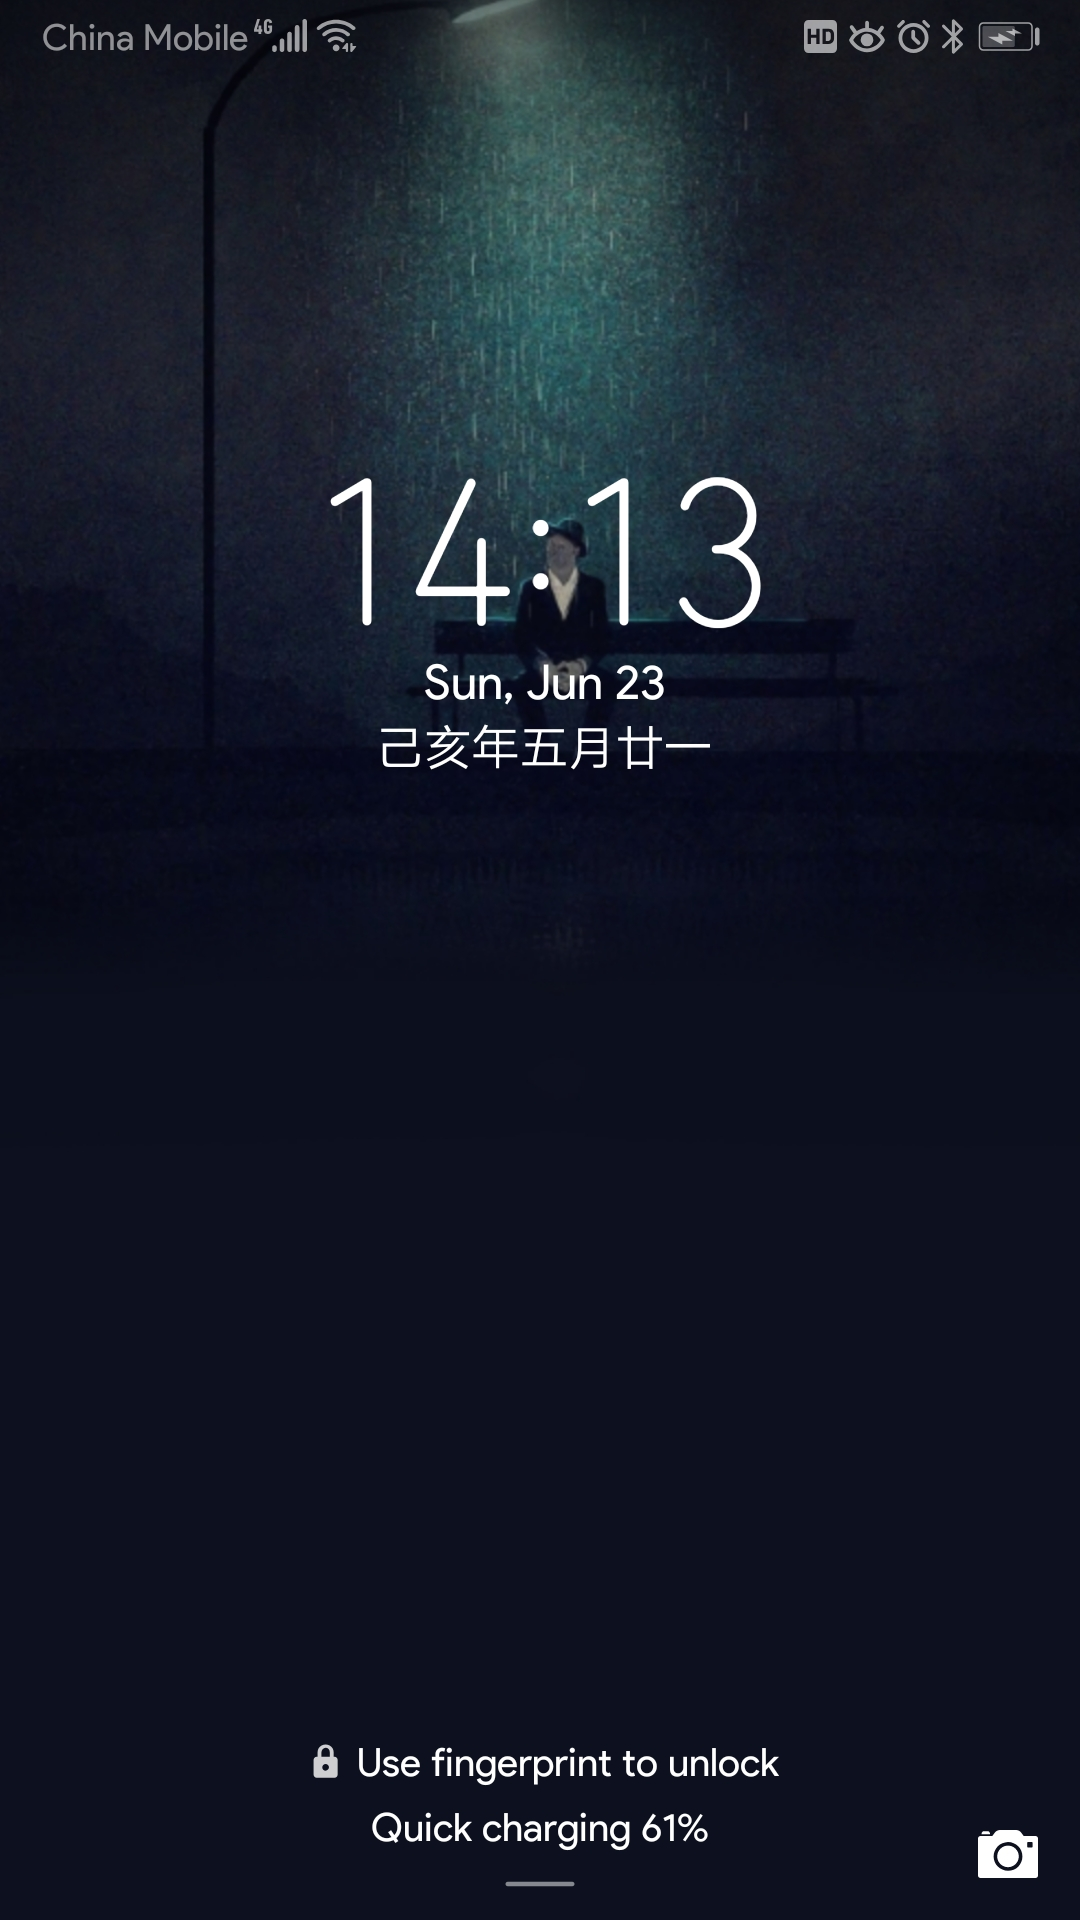 Screenshot_20190623_141319_com.android.keyguard.jpg